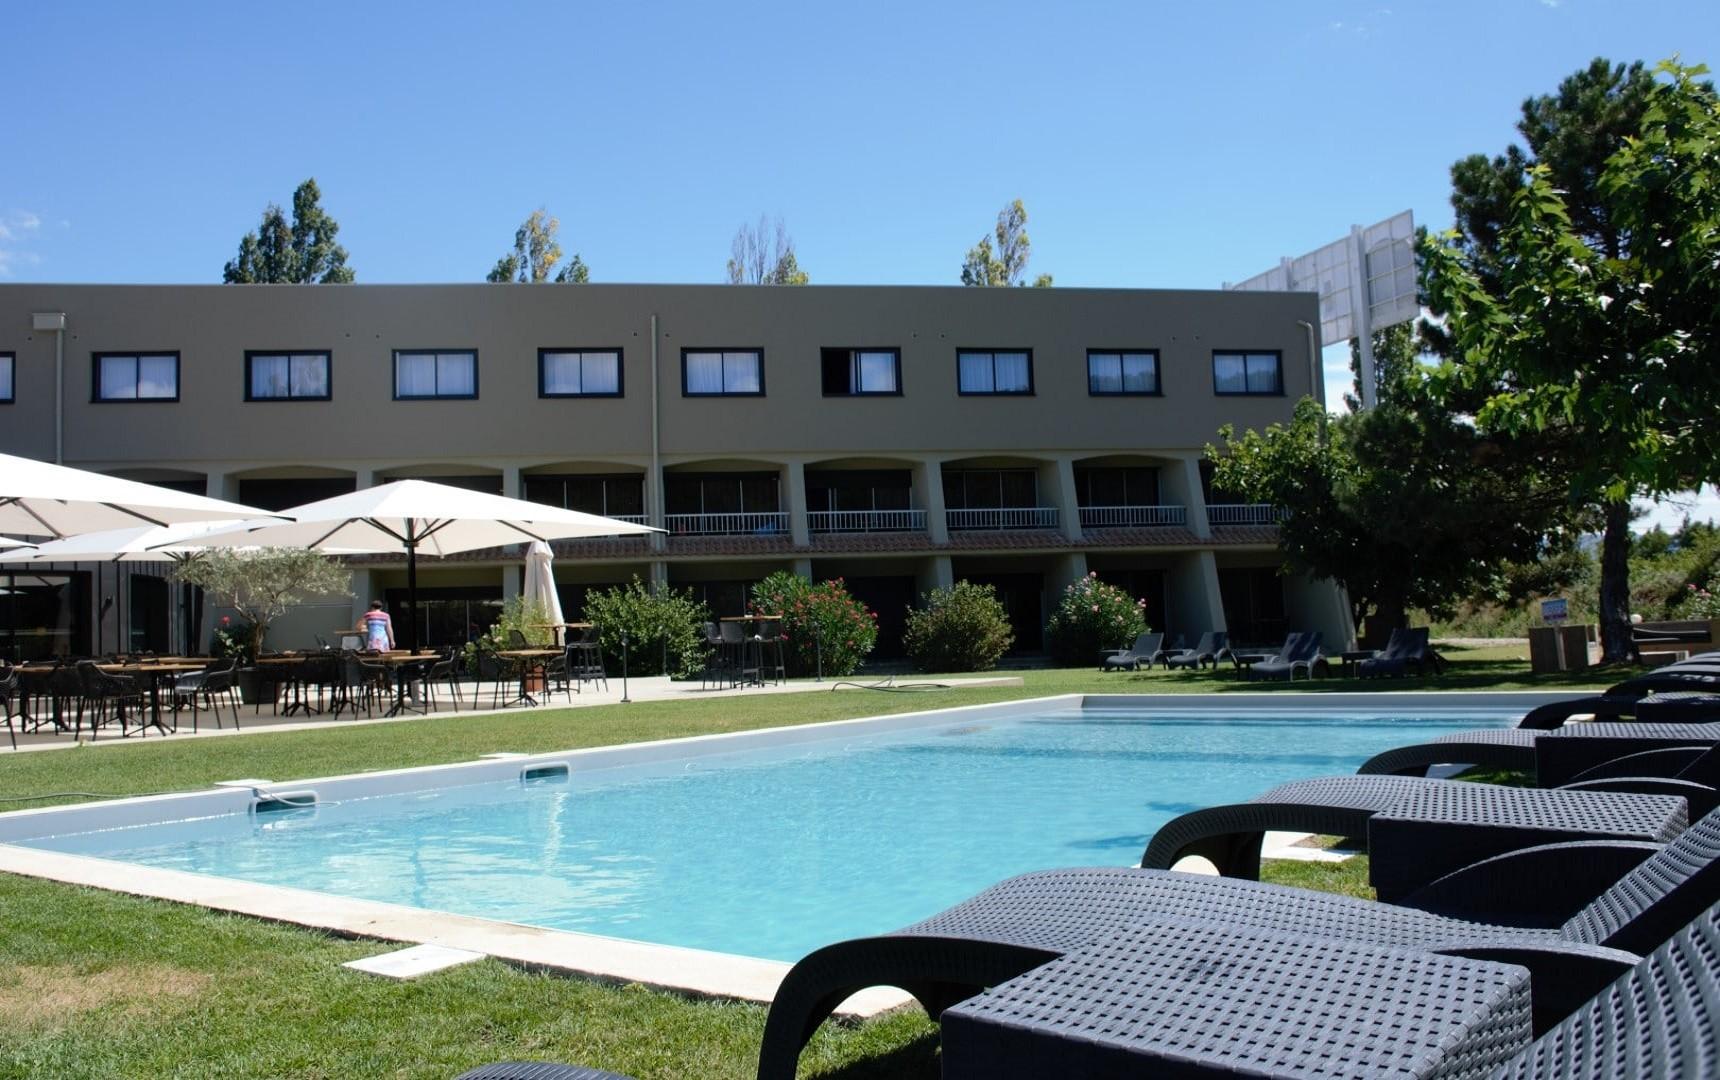 Clos-Syrah-Valence-seminaires-de-caractere-piscine